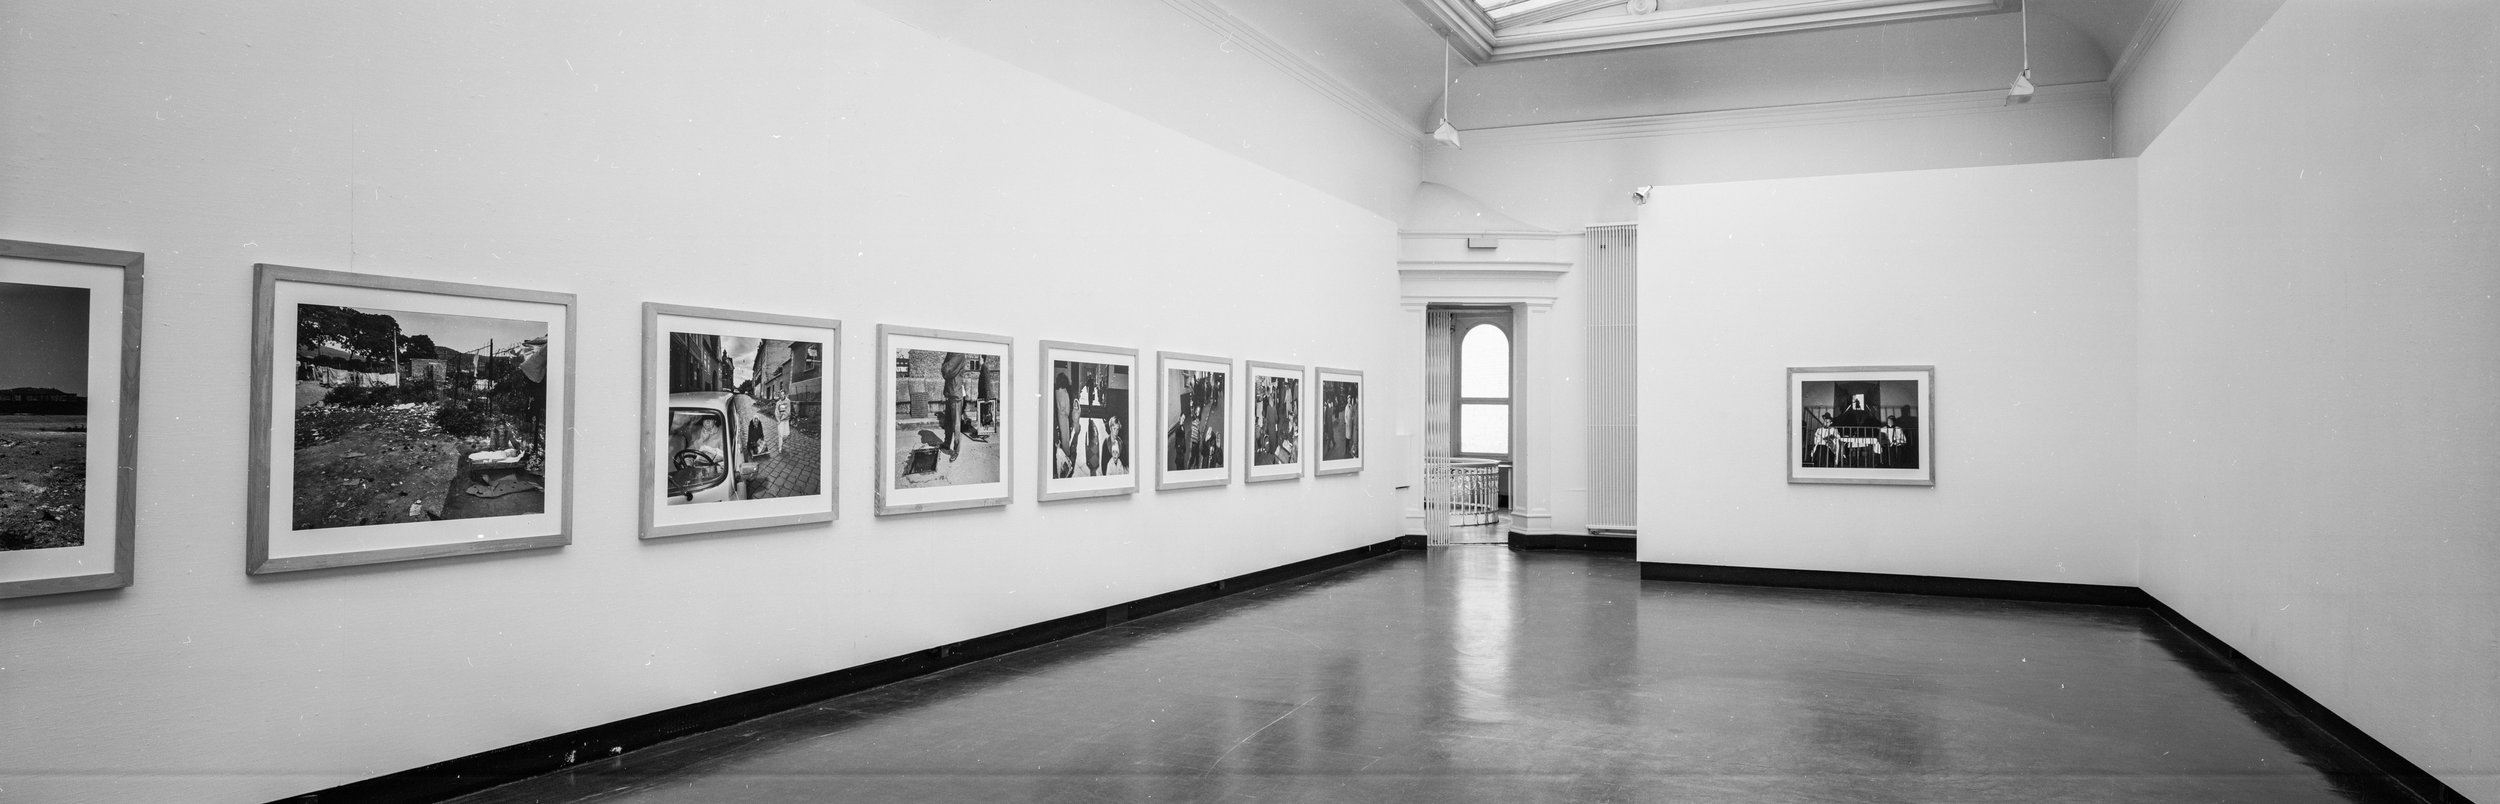 09-07-18-neg-kleur-expo-Tableaux-1996-Panoramisch-7 001.jpg